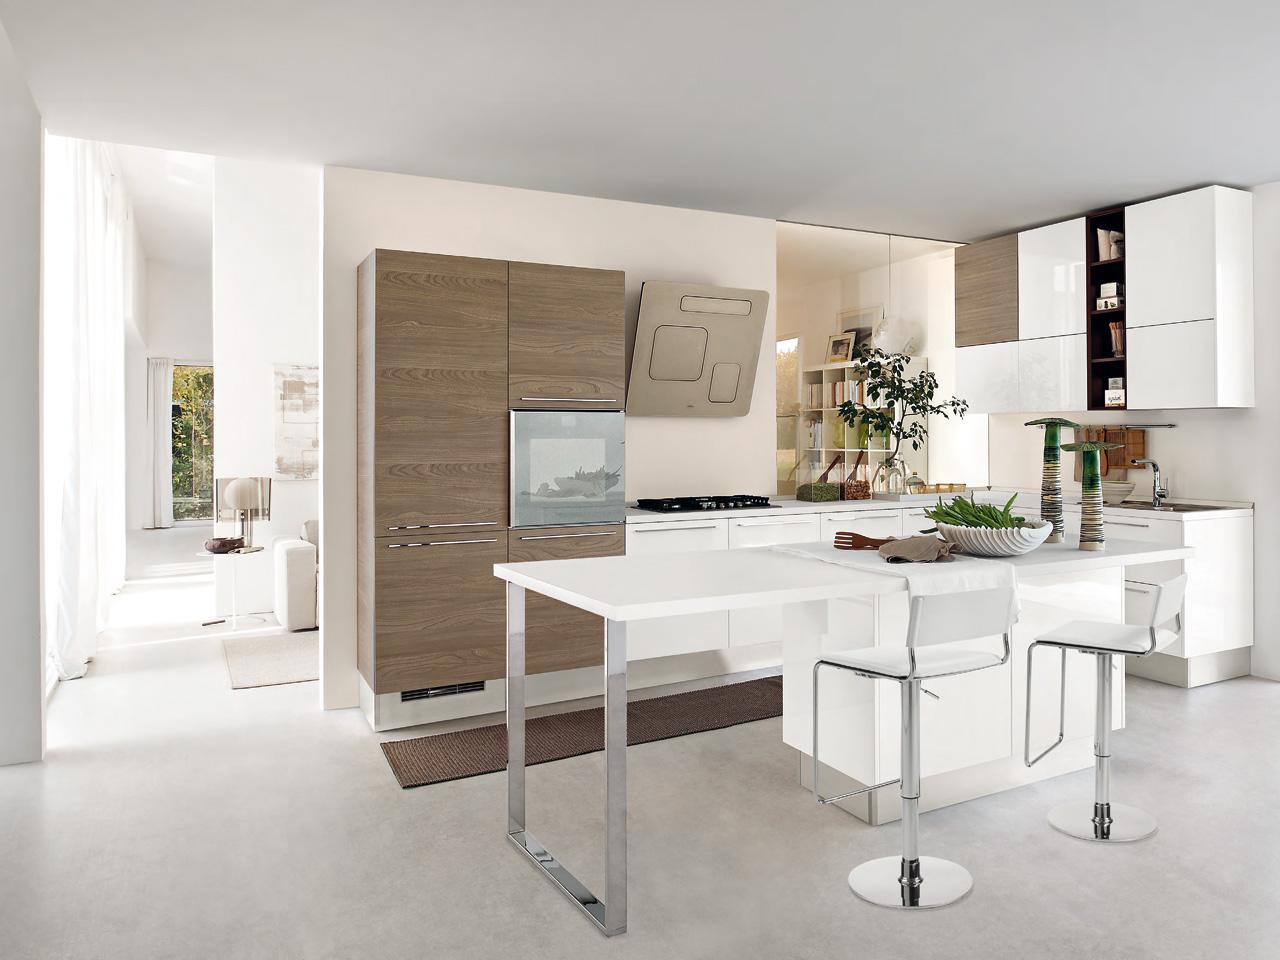 Cucine Piccole Dimensioni Ikea : Cucine Di Piccole Dimensioni Ikea  #495E31 1280 960 Carrelli Da Cucina Al Mercatone Uno